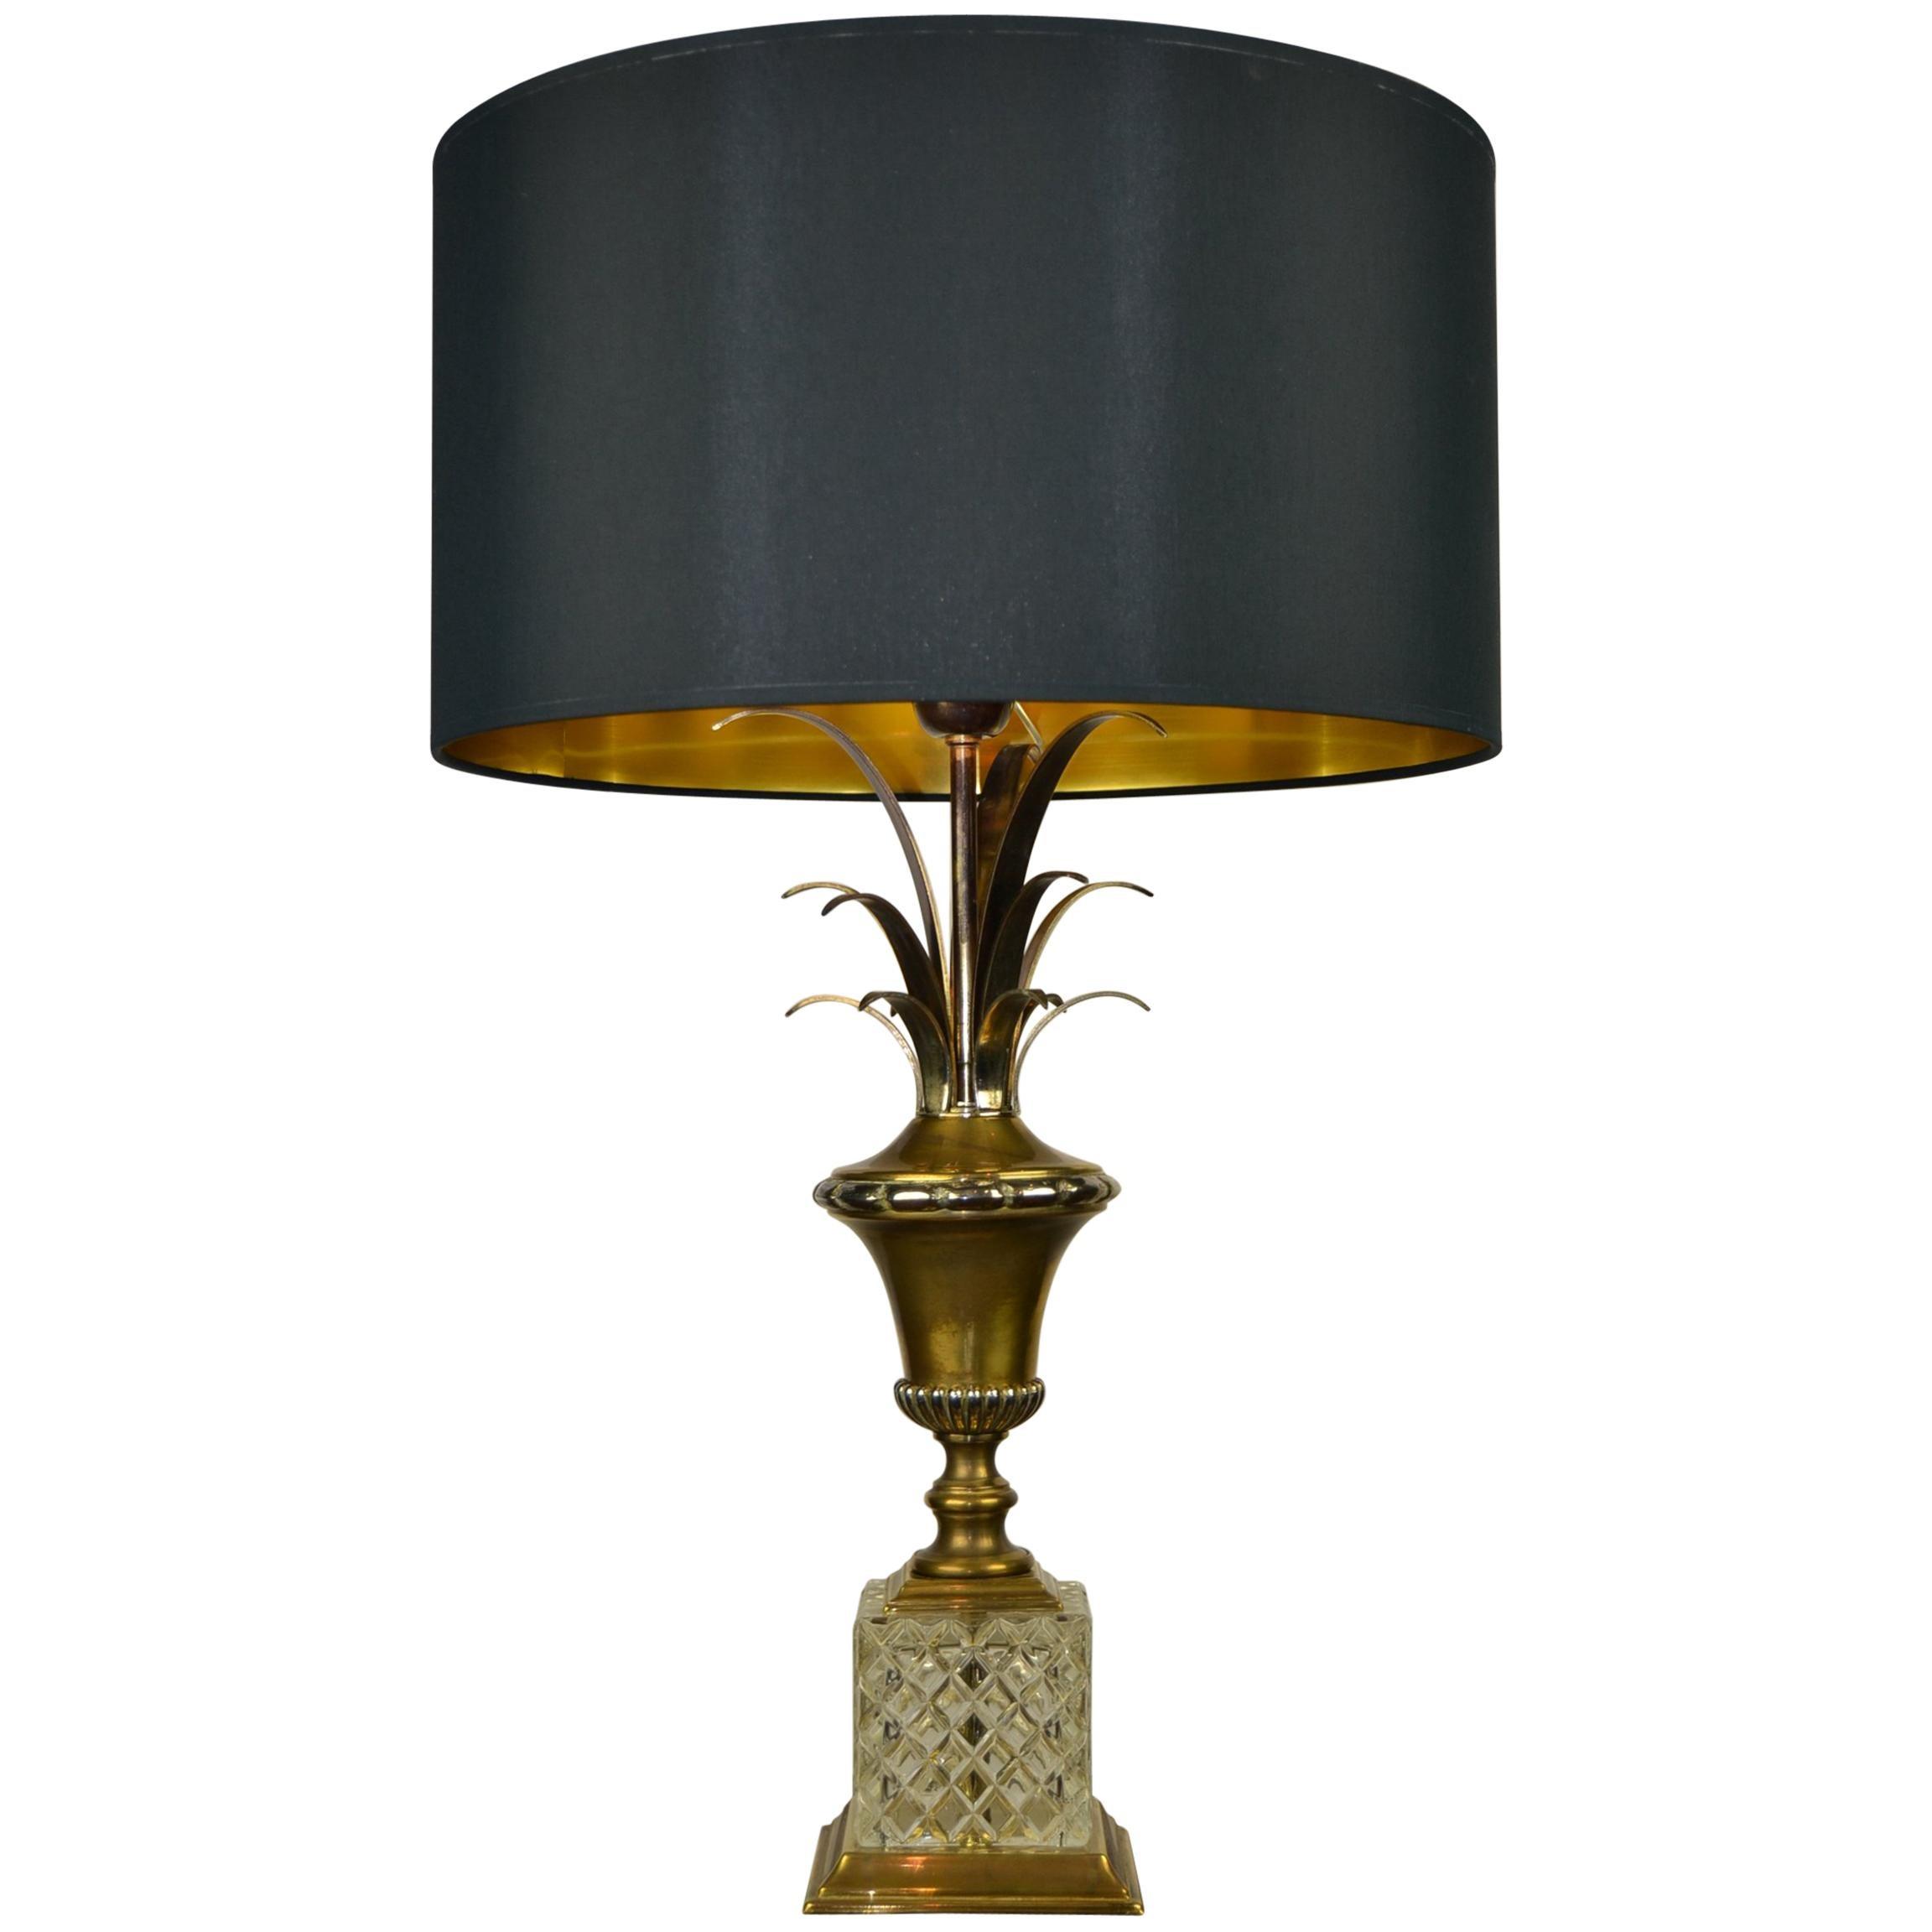 Hollywood Regency Pineapple Leaf Table Lamp, Gilt Brass and Crystal, France